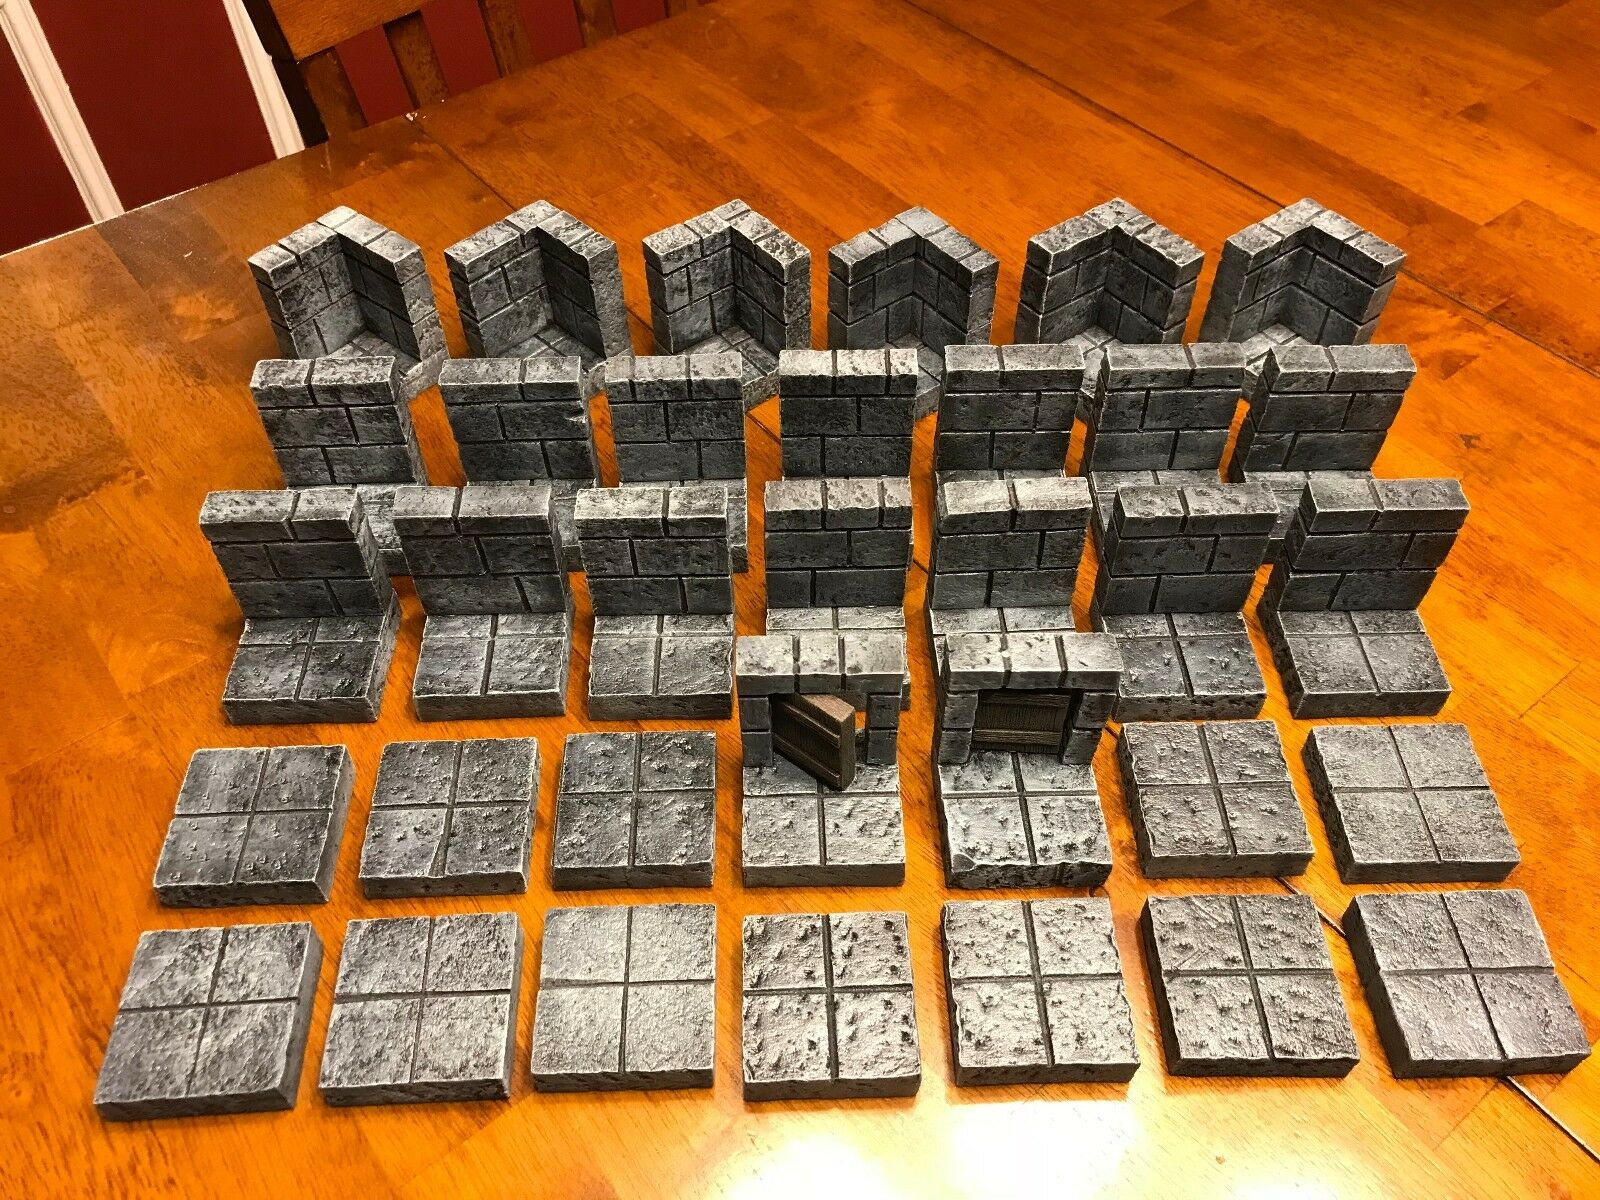 Dungeon Big Modular Tile Set 28mm Dungeons & Dragons Pathfinder d&d Terrain